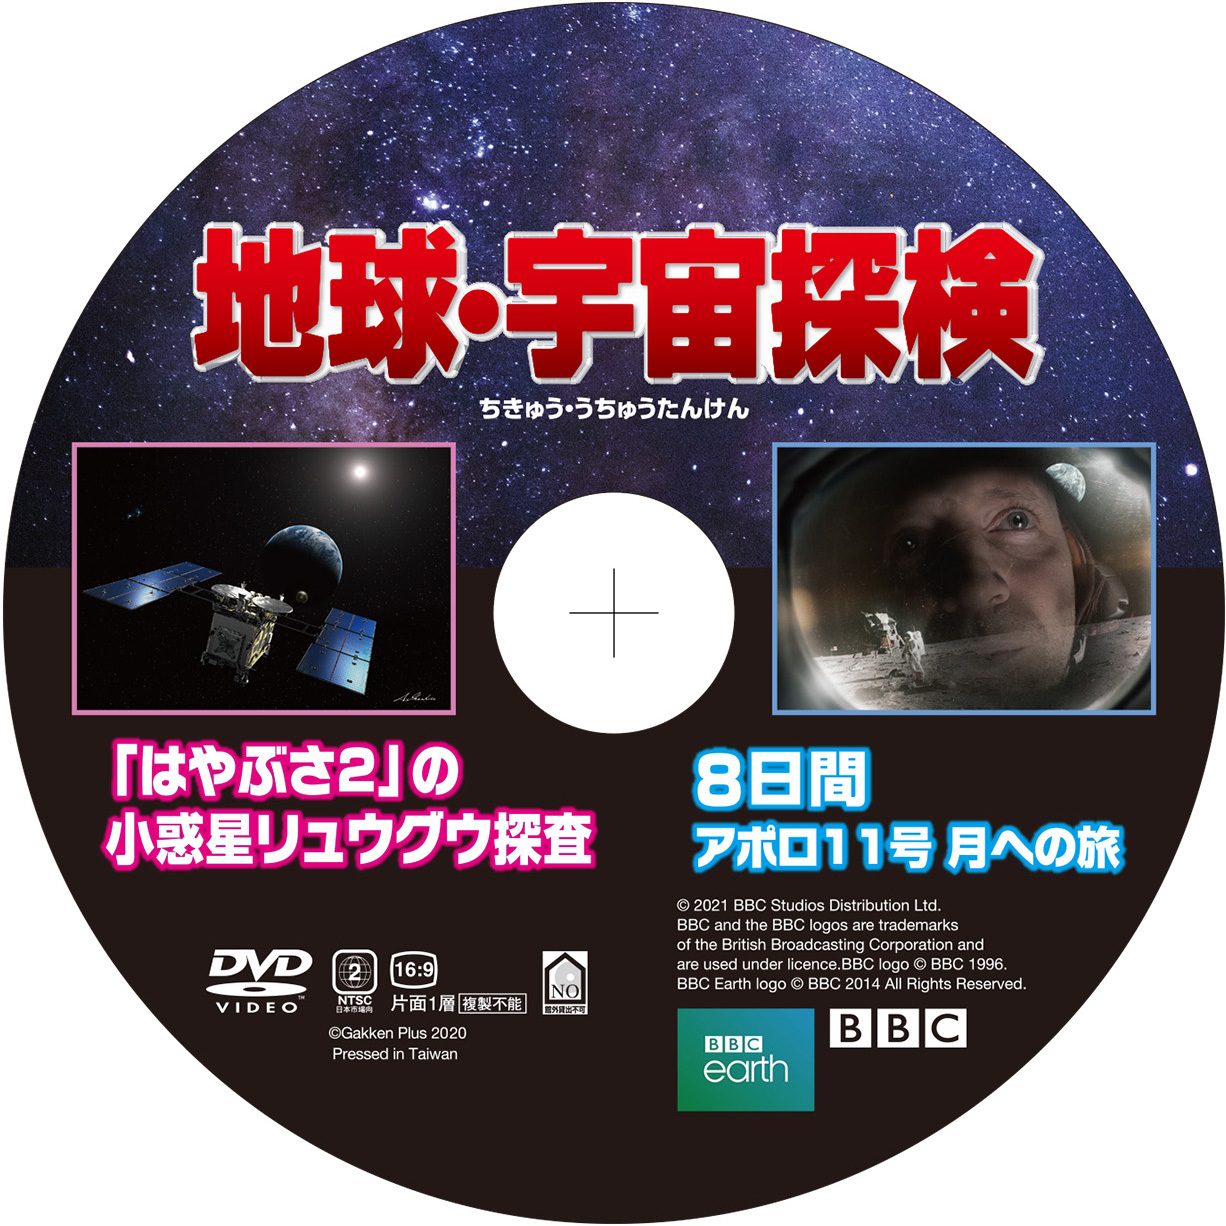 「DVD 盤面」画像